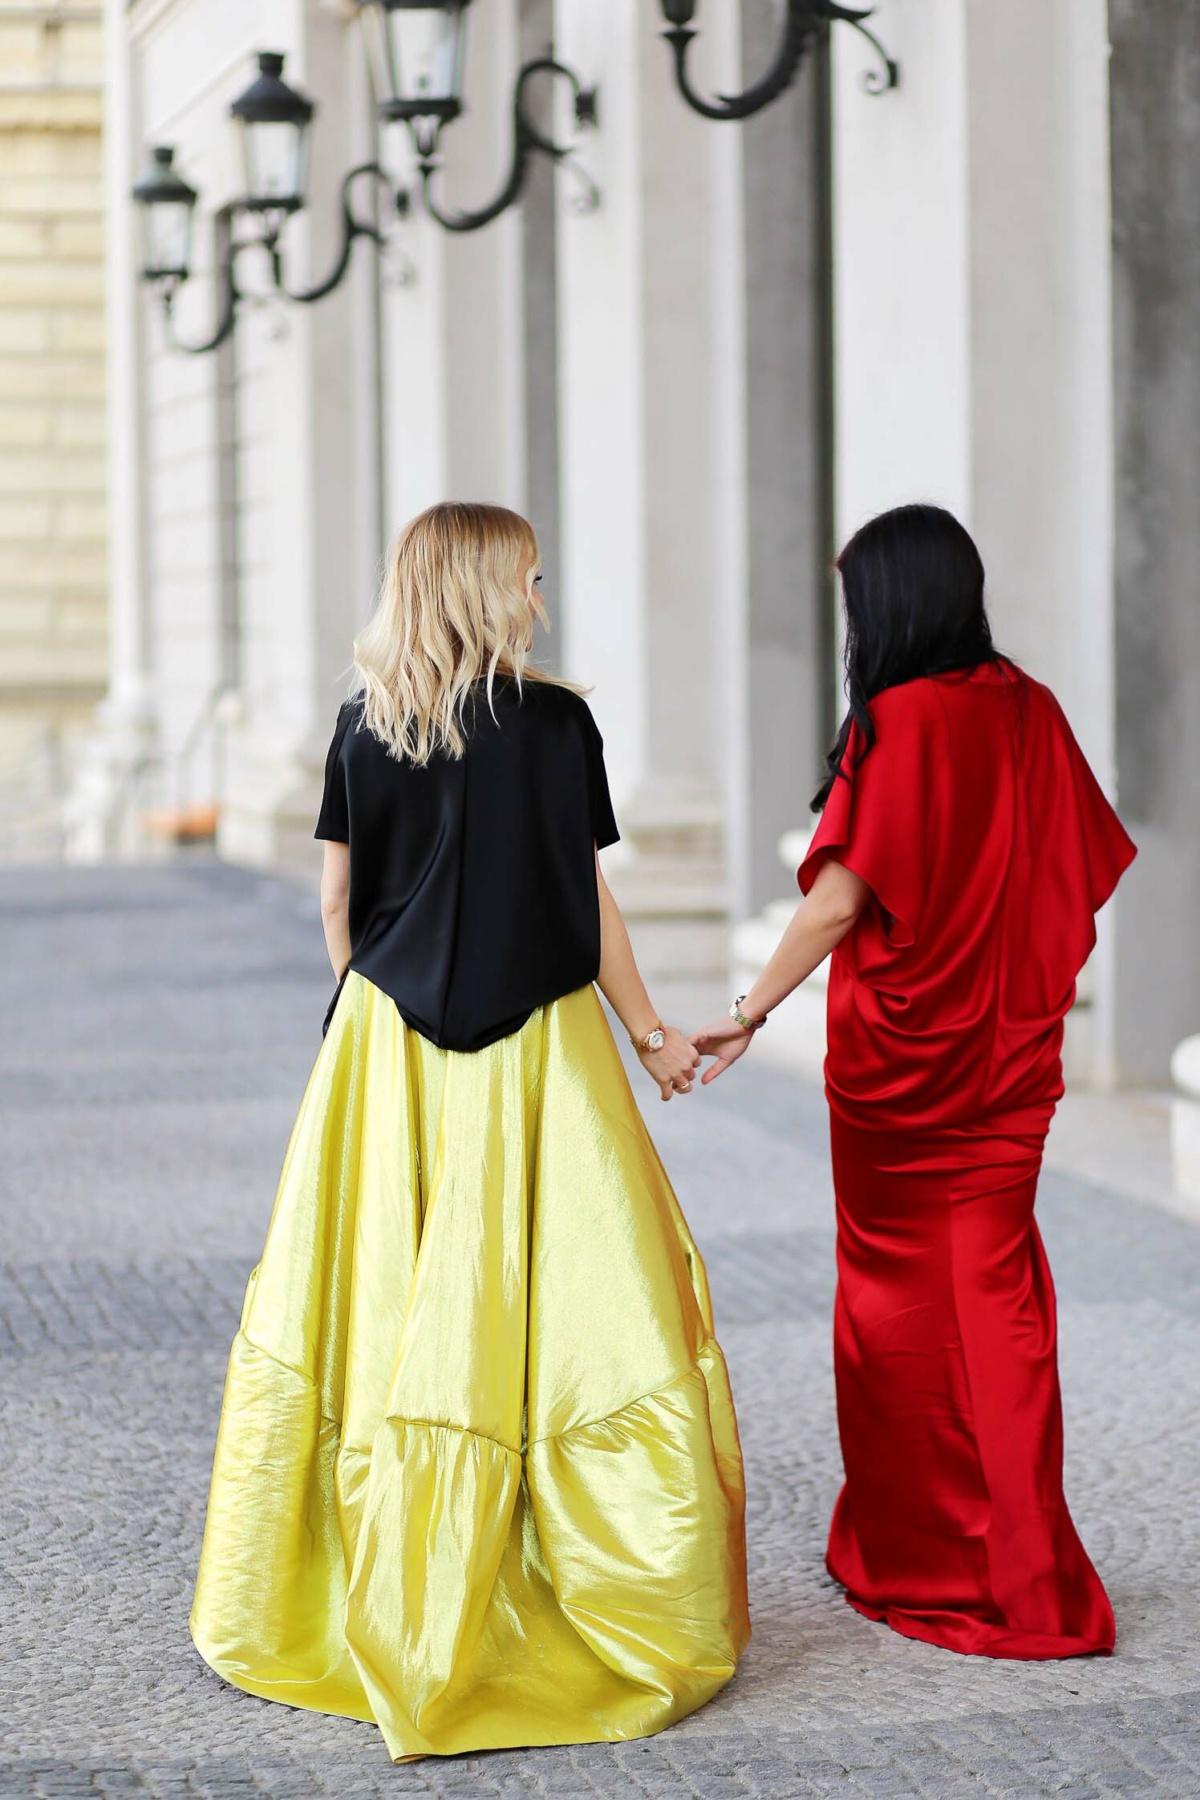 stylingliebe-fashionblog-muenchen-styleblog-munich-blogger-deutschland-fashionblogger-bloggerdeutschland-lifestyleblog-modeblog-germanblogger-bambi-verleihung-2016-4